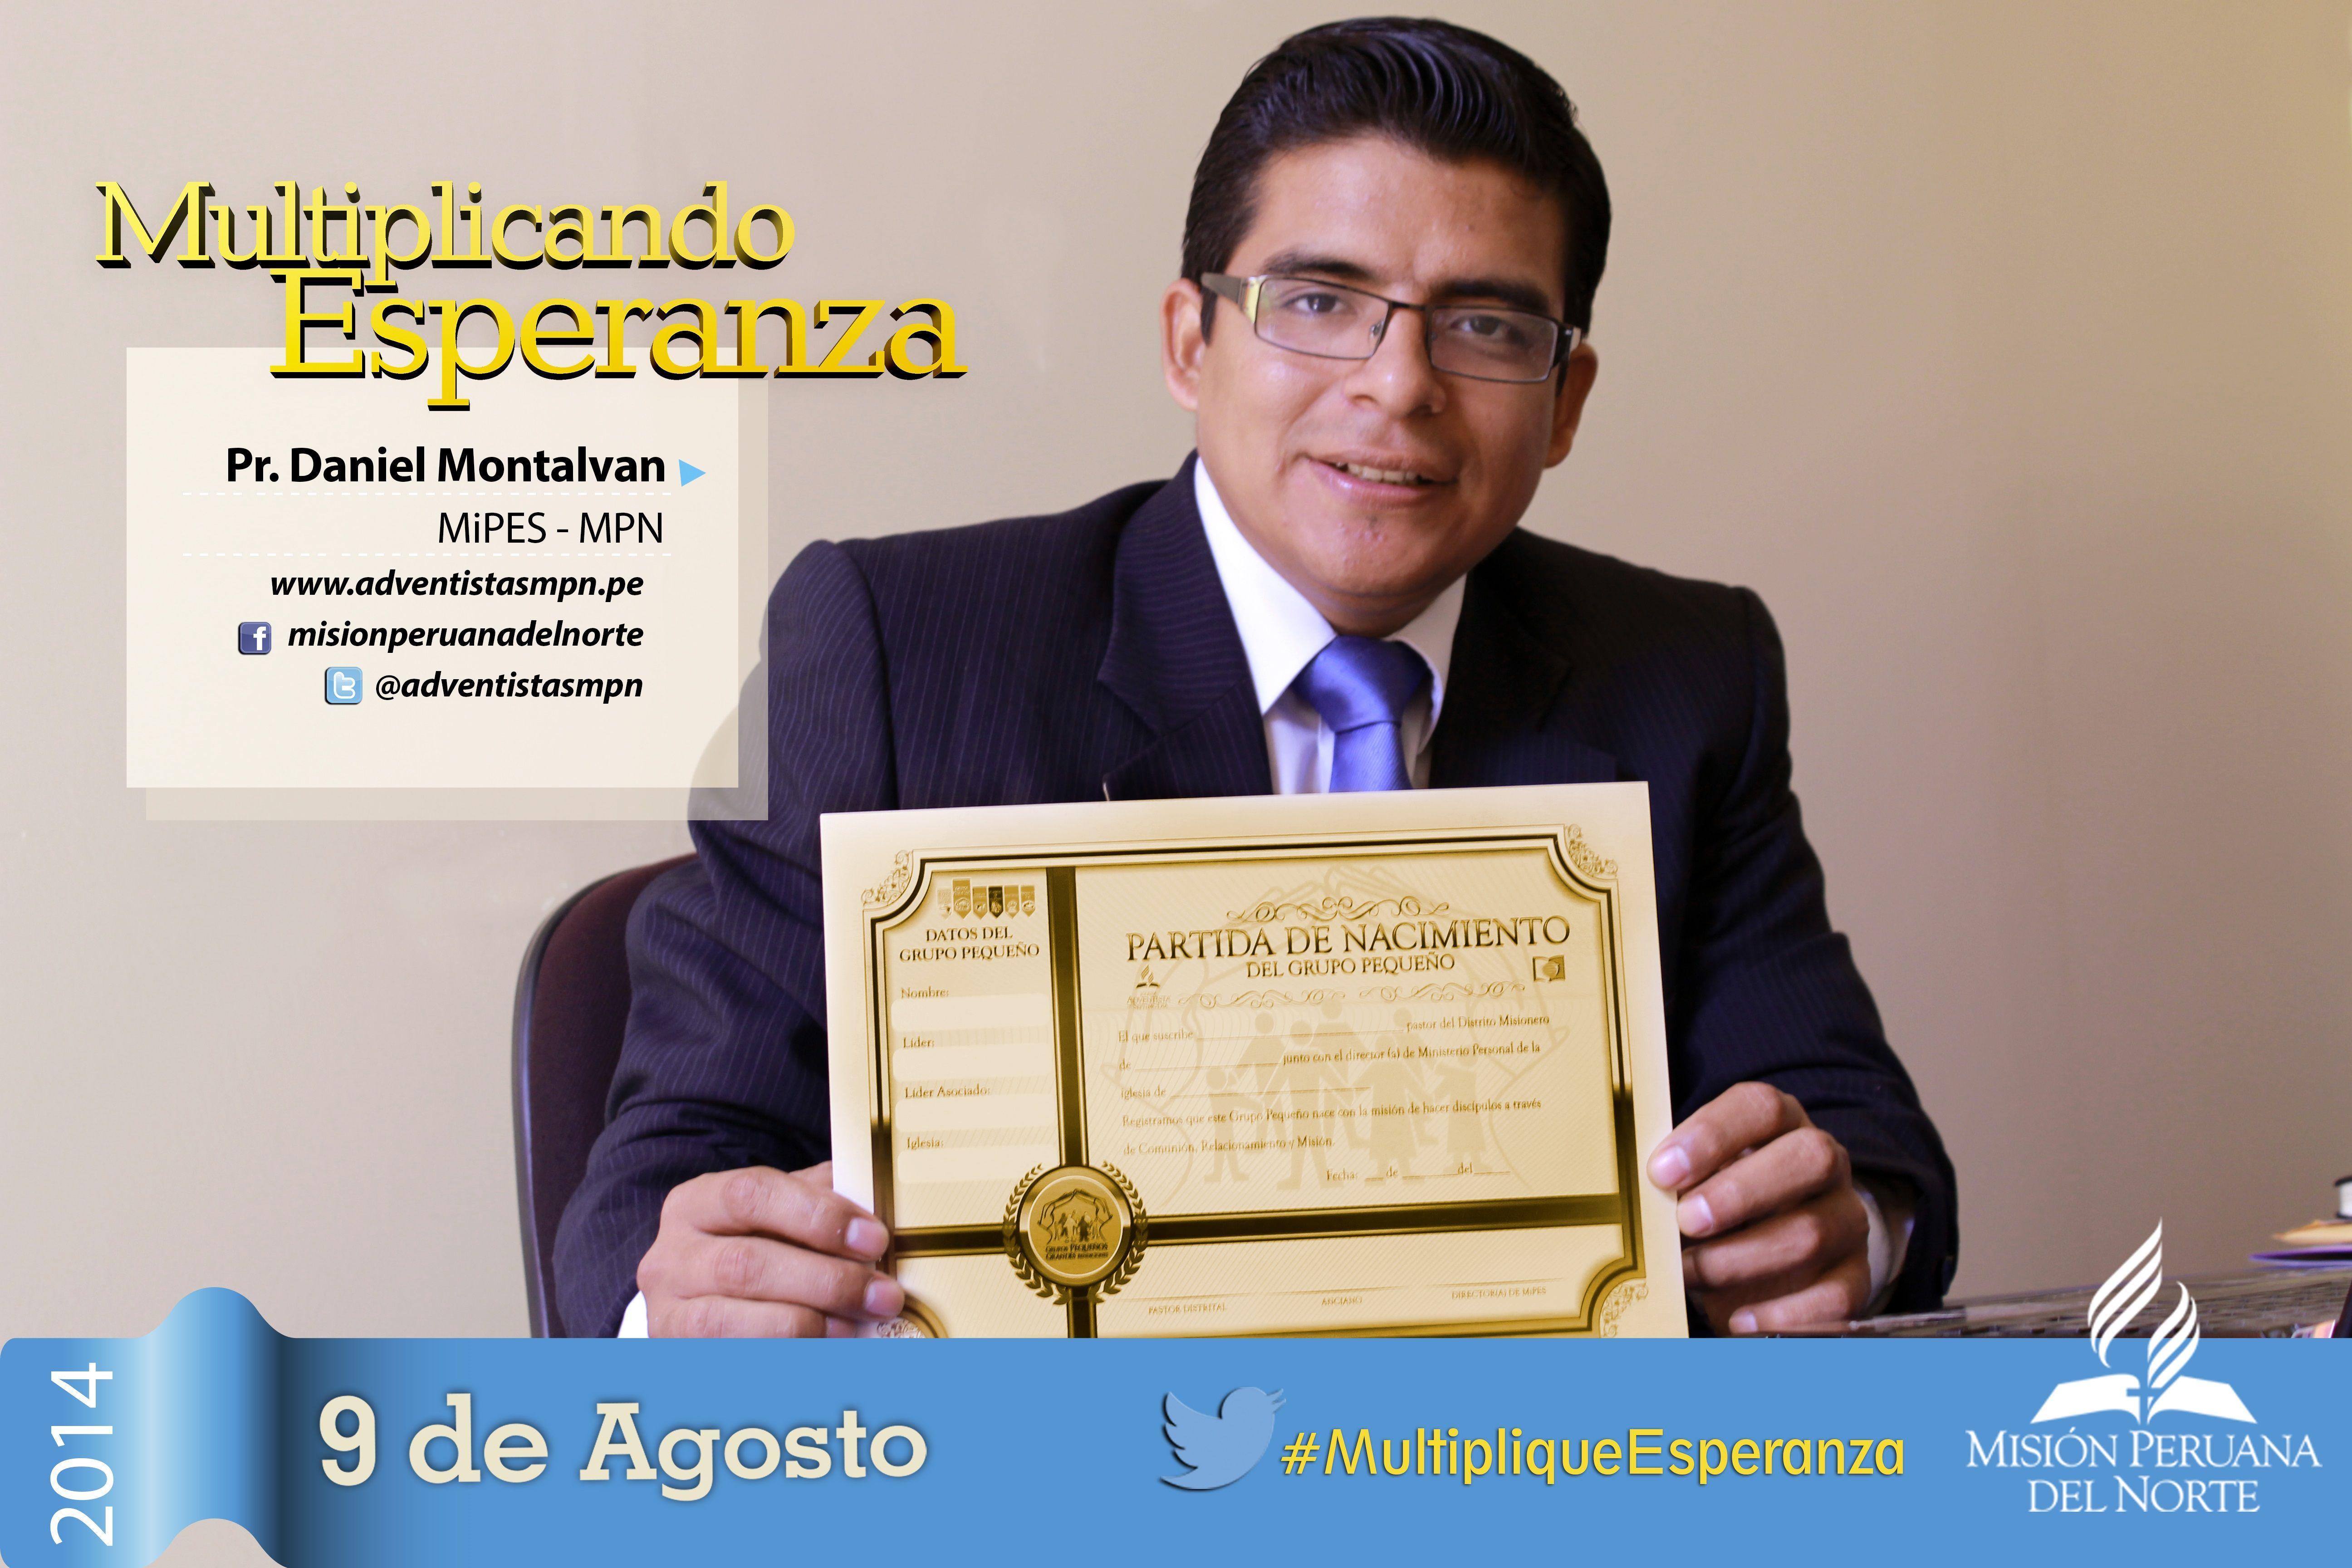 Participa este 9 de Agosto de #MultipliqueEsperanza